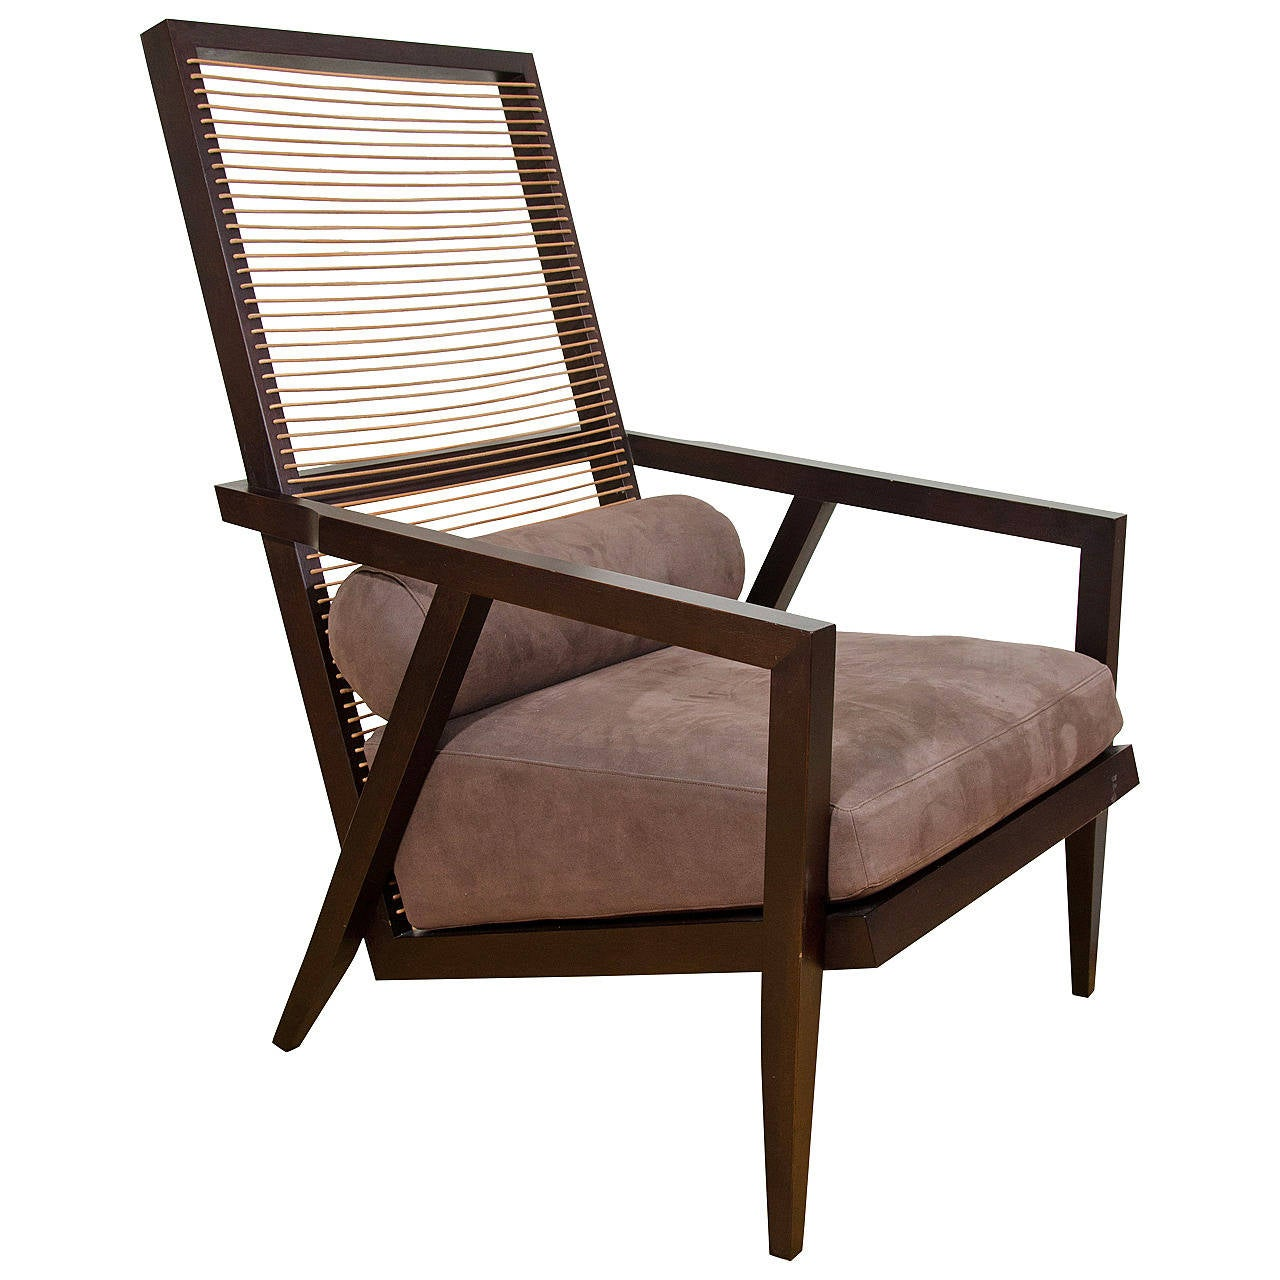 High back antique chairs - Pierantonio Bonacina Astoria High Back Lounge Chair 1